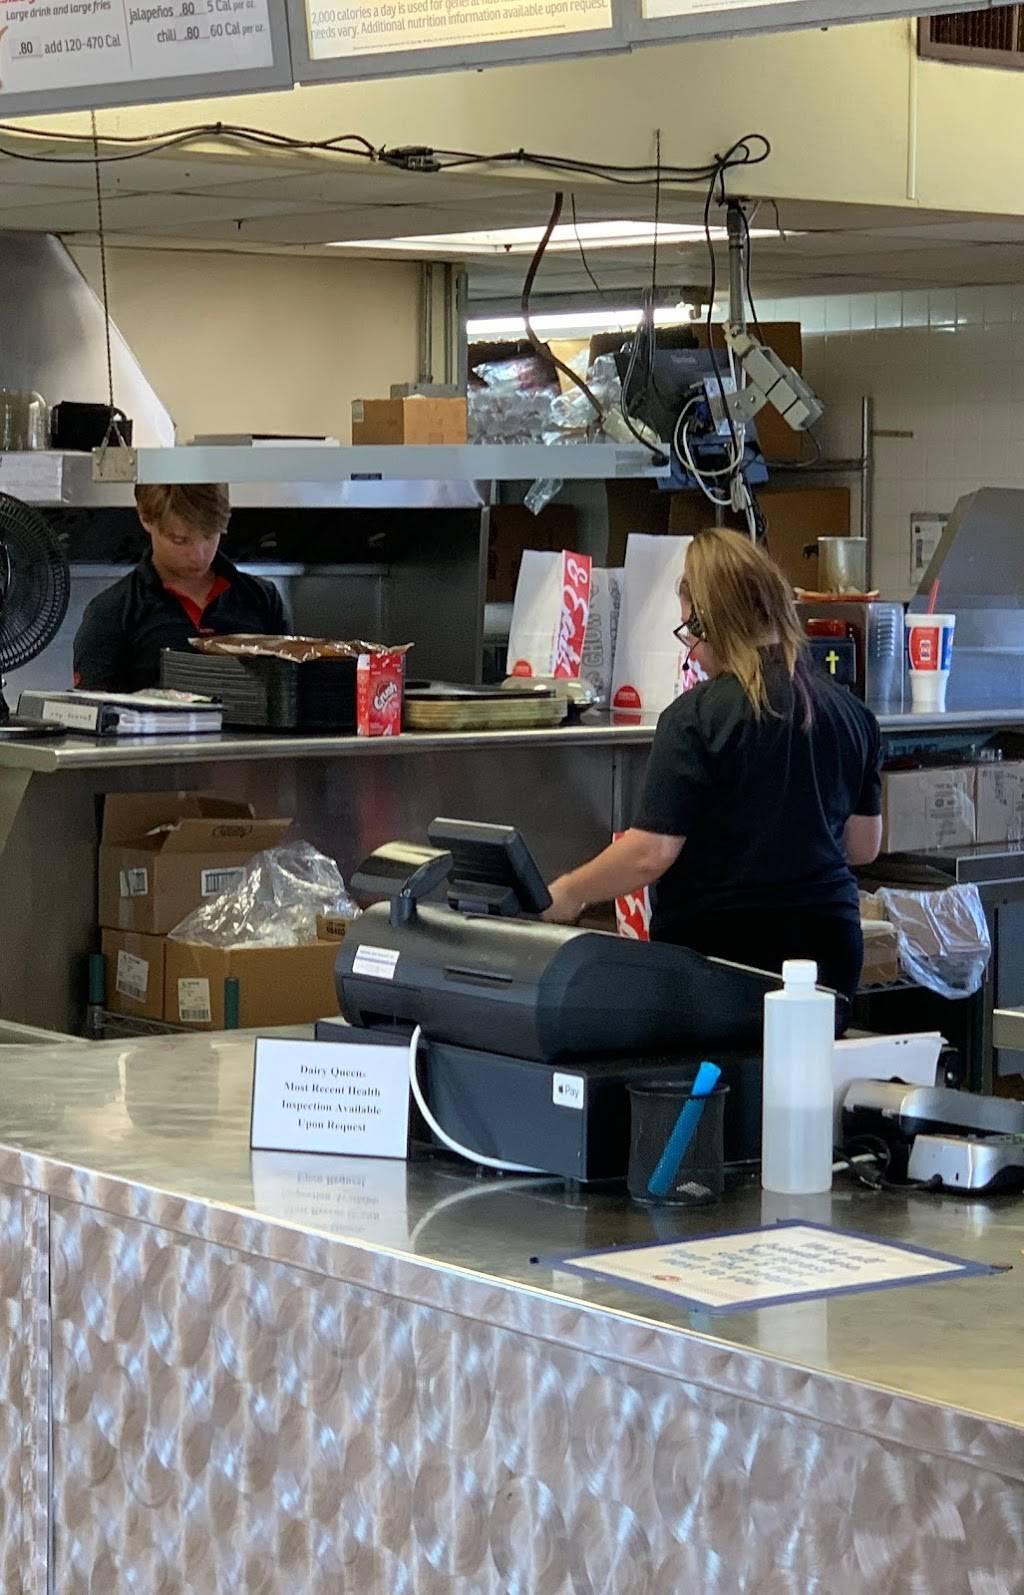 Dairy Queen Store | restaurant | Interstate 20 North Access Rd, Ranger, TX 76470, USA | 2546473001 OR +1 254-647-3001